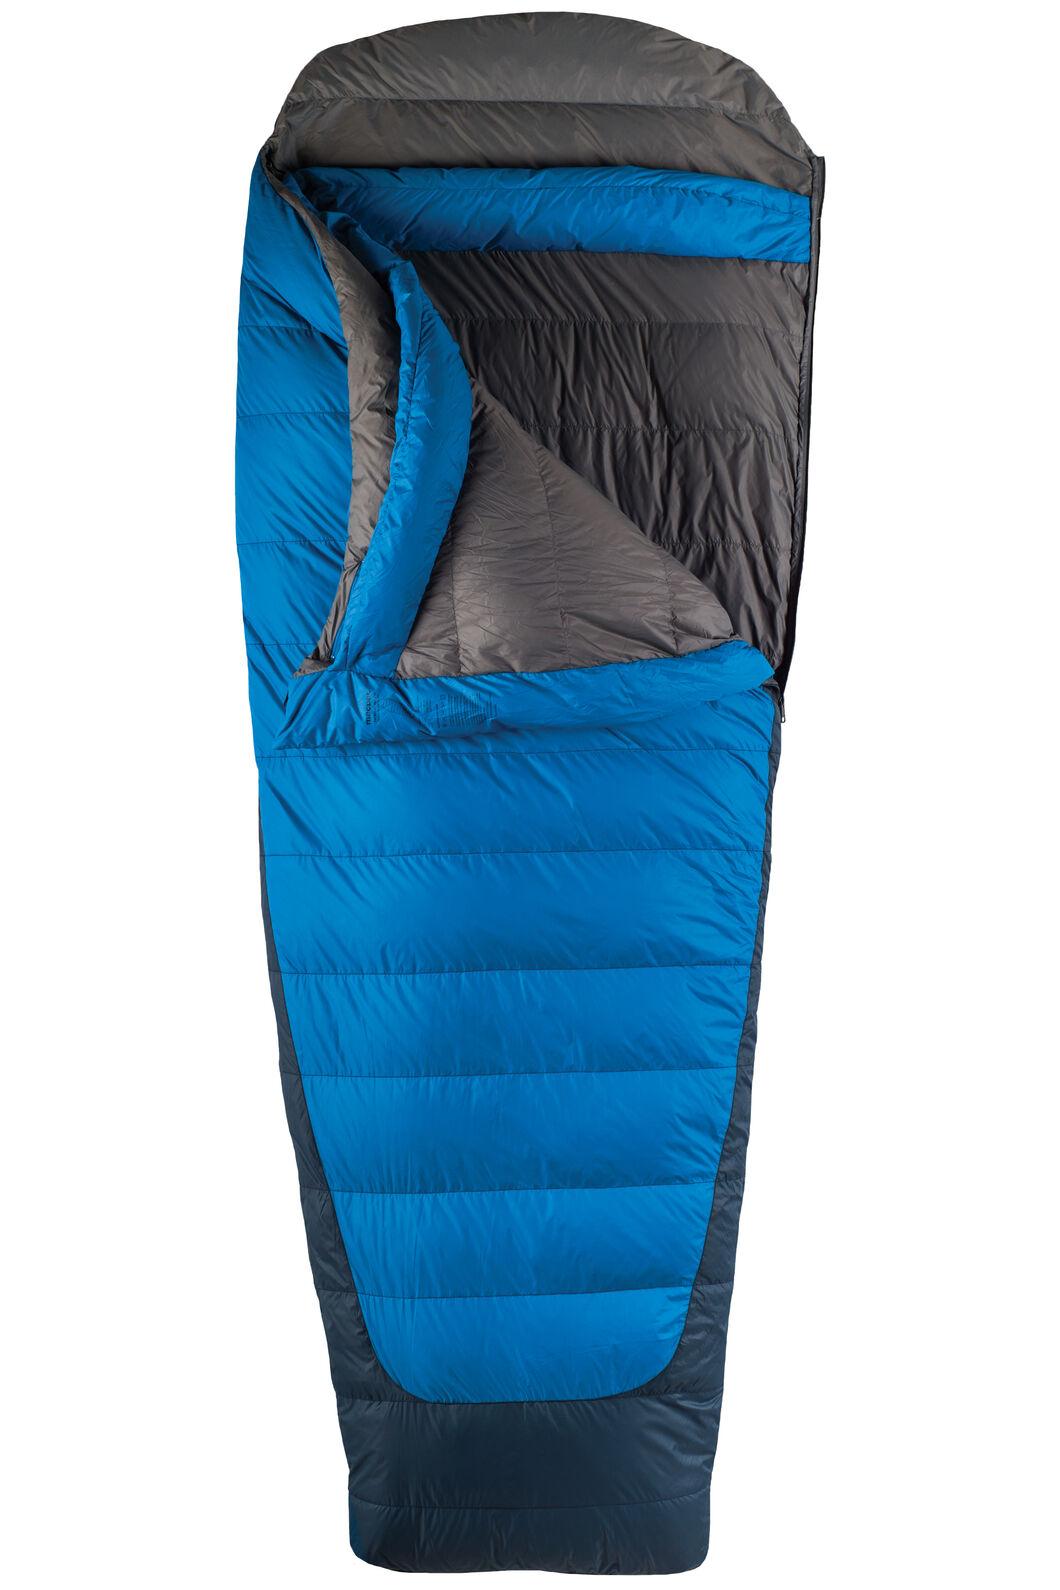 Macpac Escapade Down 500 Sleeping Bag - Women's, Classic Blue, hi-res